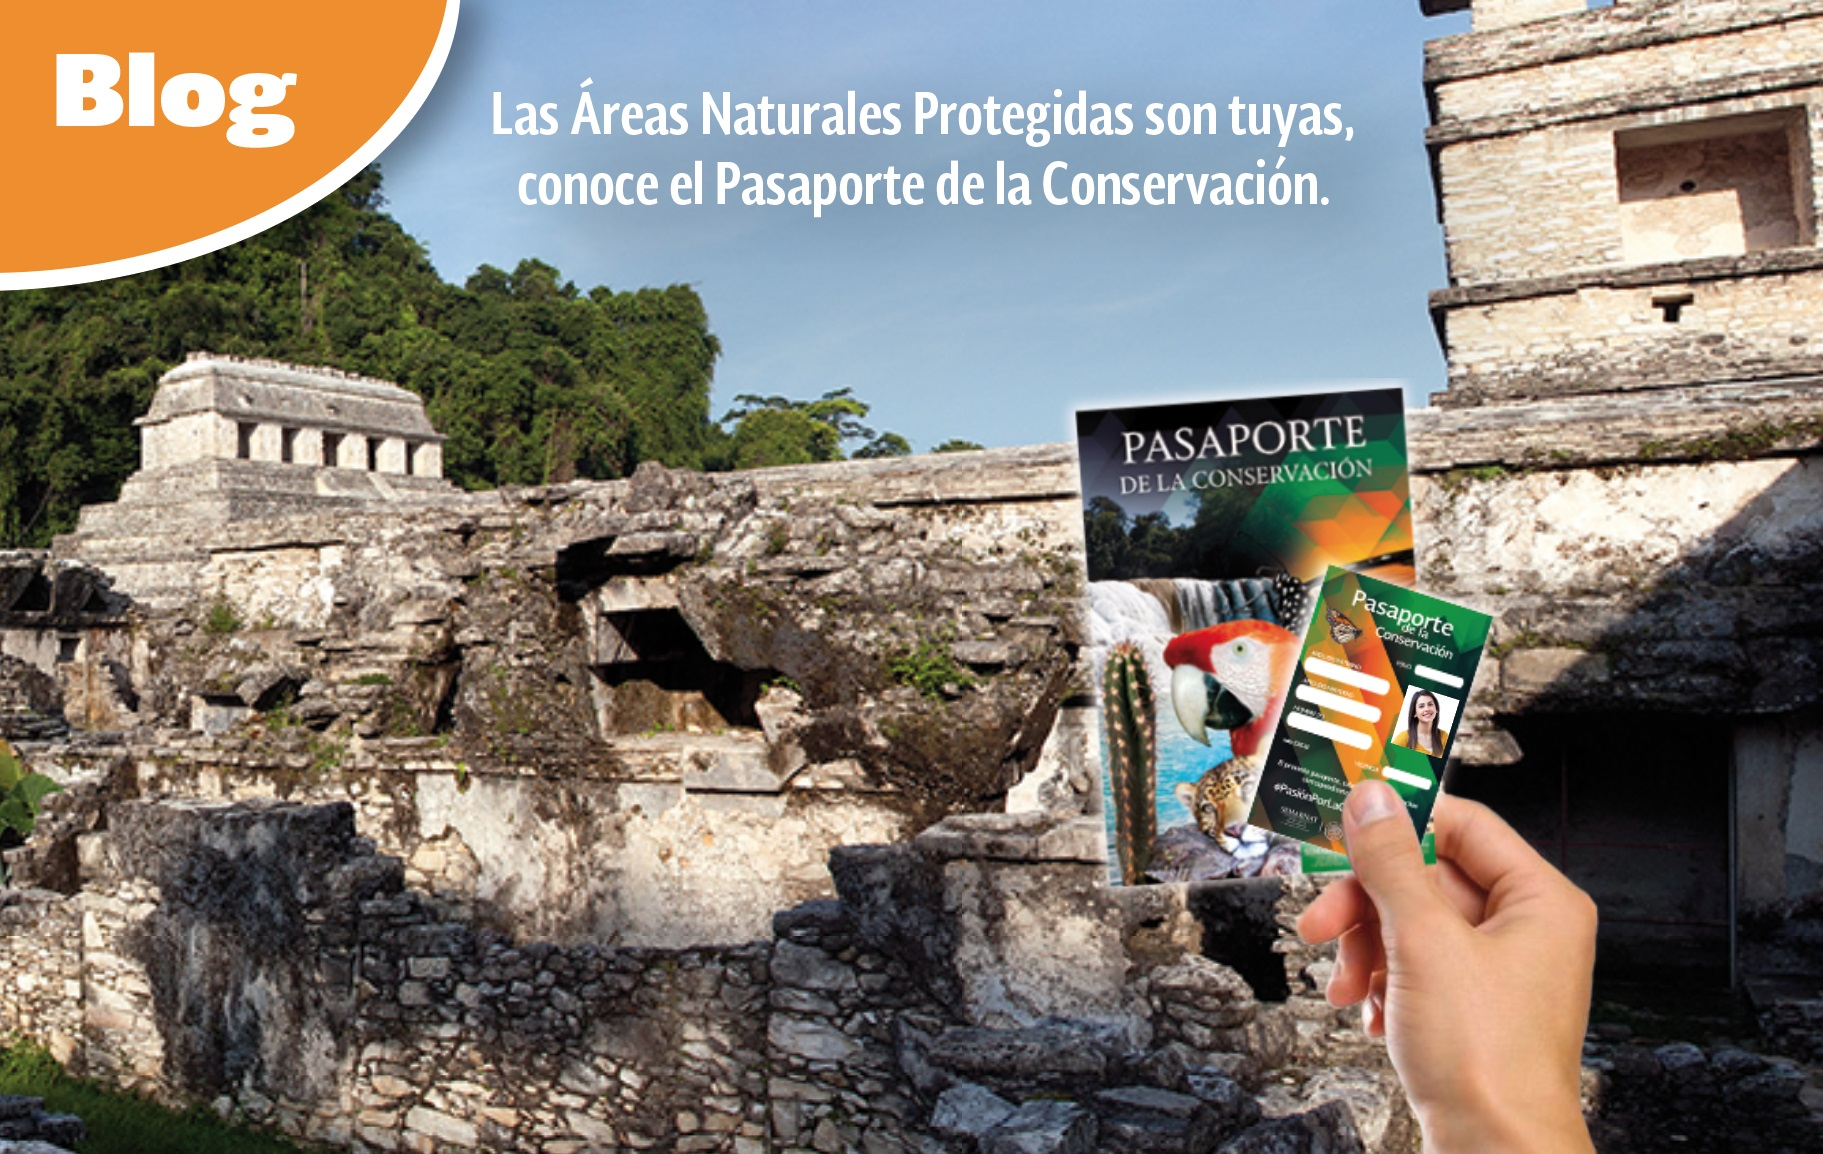 Pasaporte de la Conservación